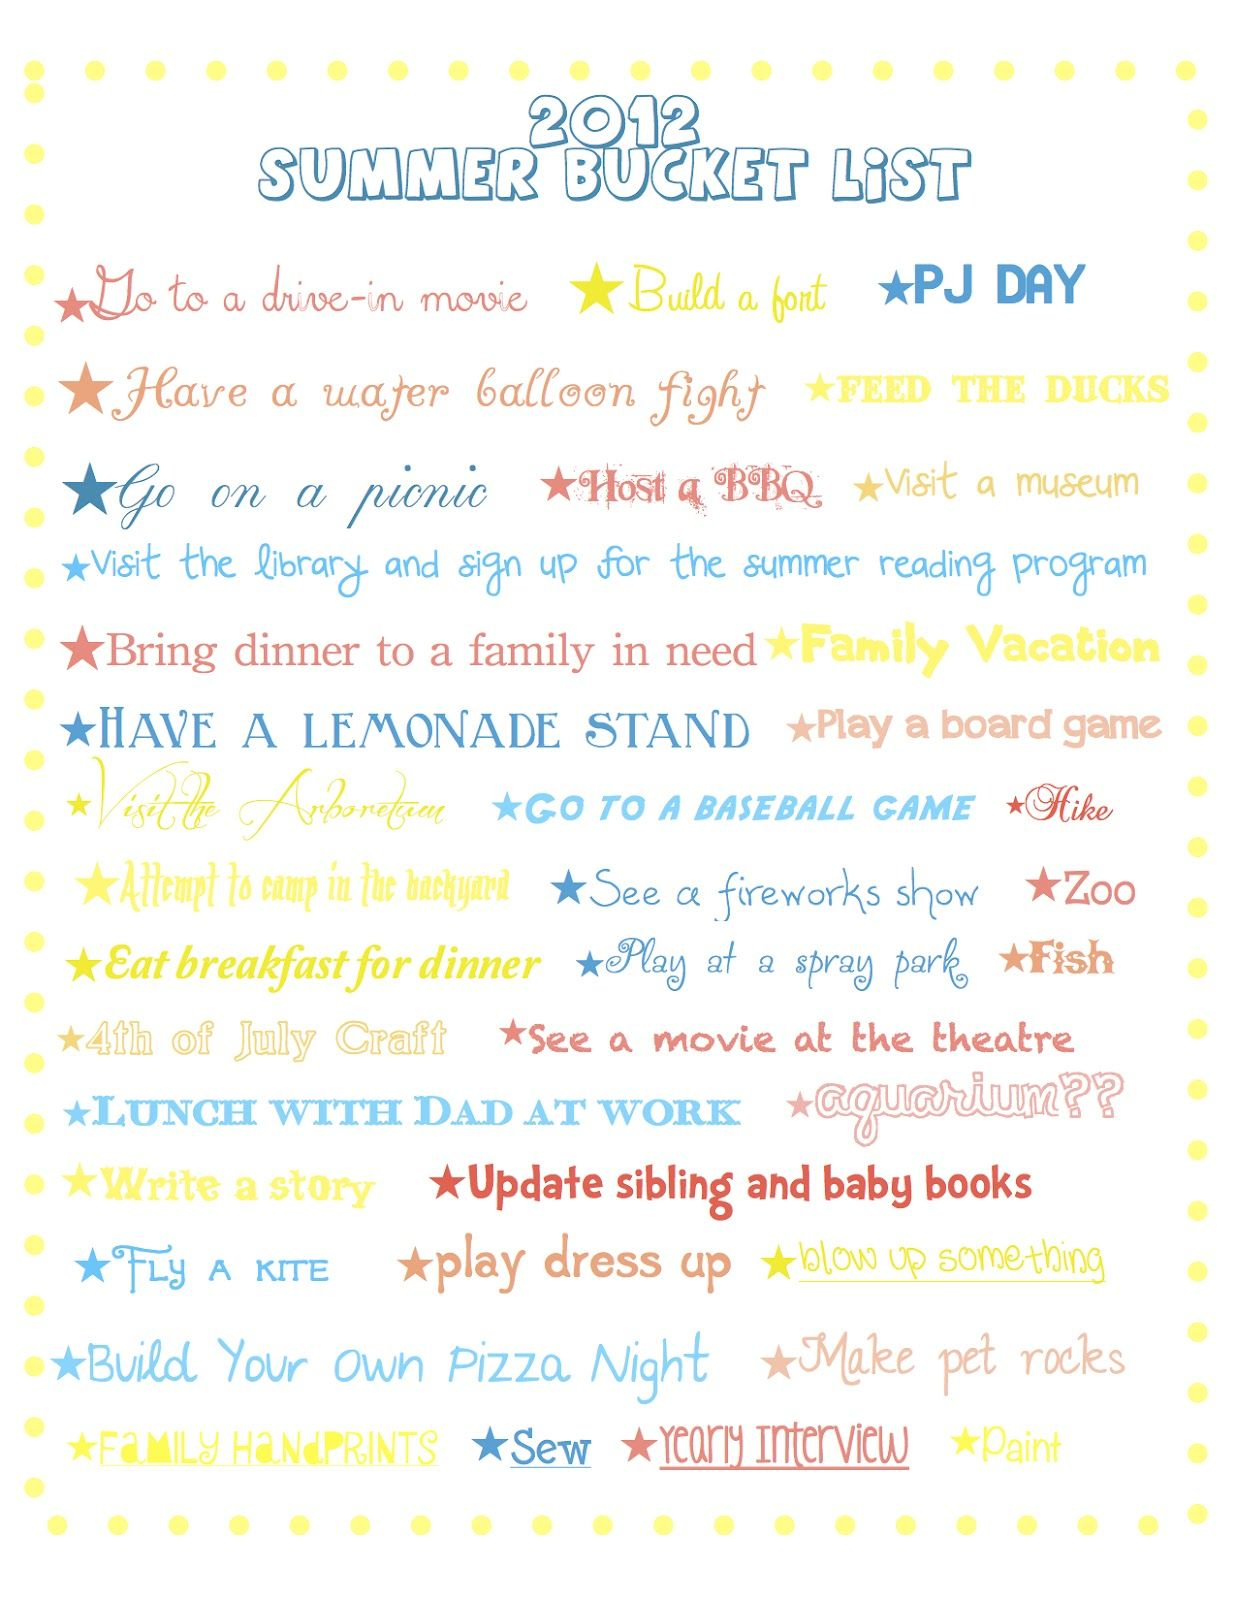 Summer Bucket List Fun To Do With Kids